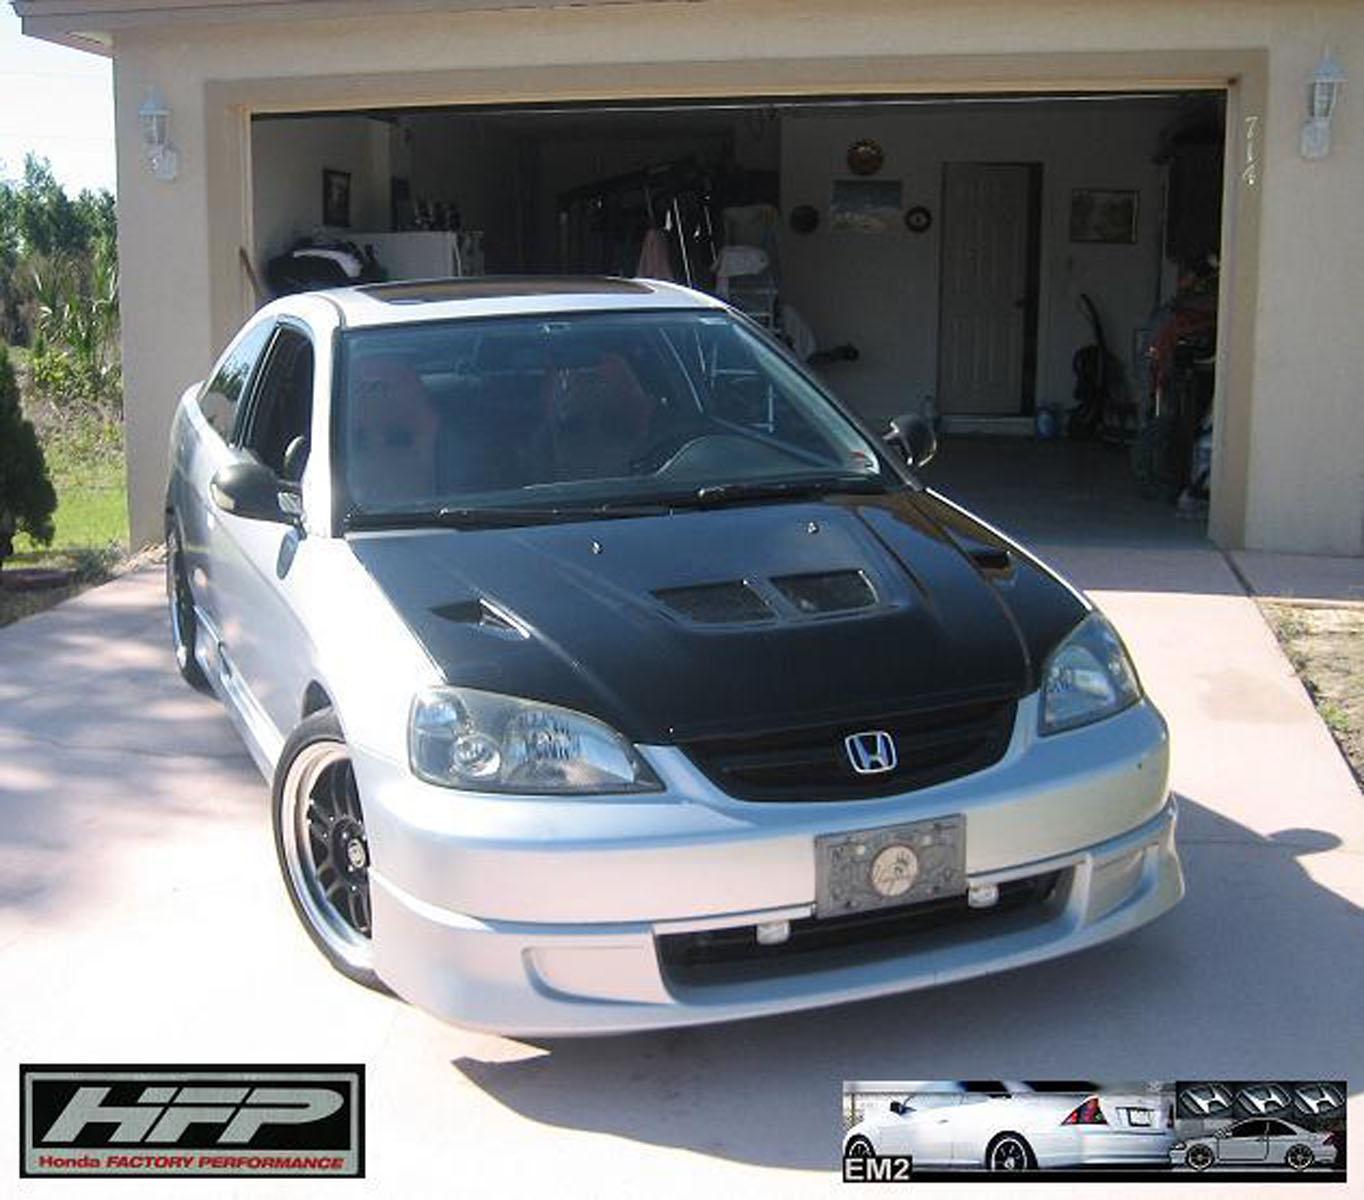 2003 Honda Honda Factory Performance [Civic] EX For Sale